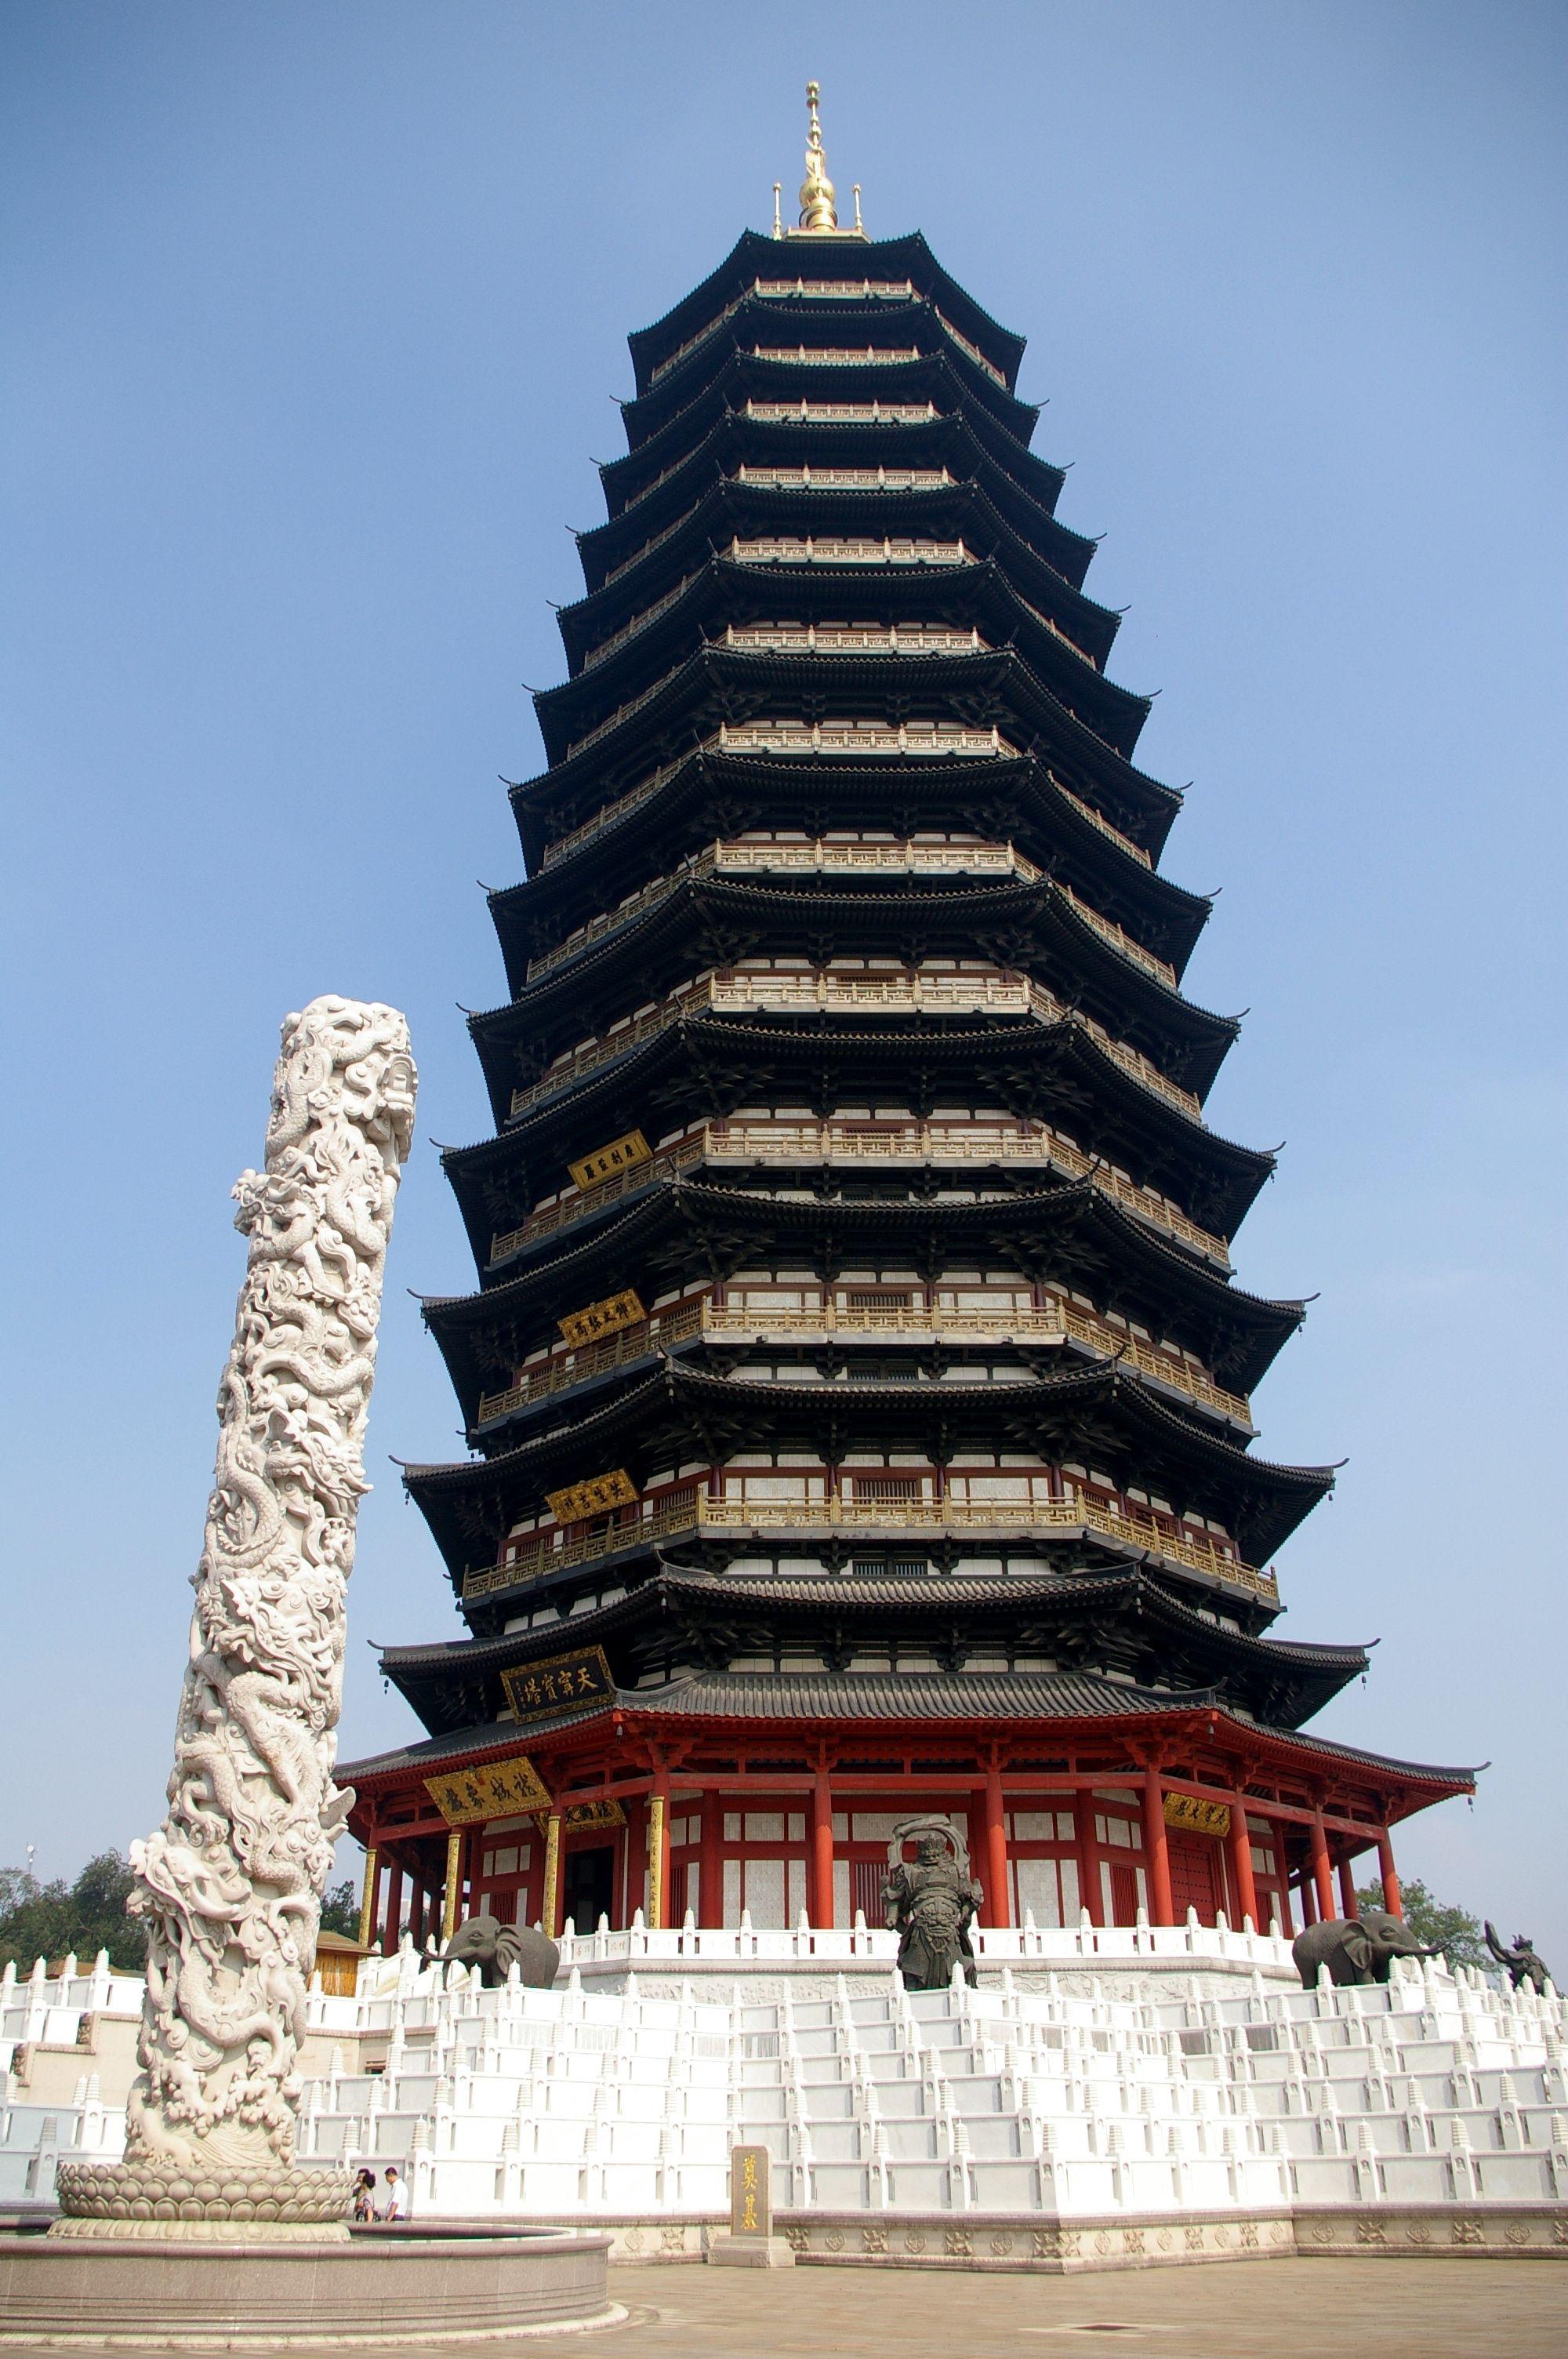 Tianning Pagoda In Changzhou Chine Cette Pagode En Bois Est  # Bois En Chaene